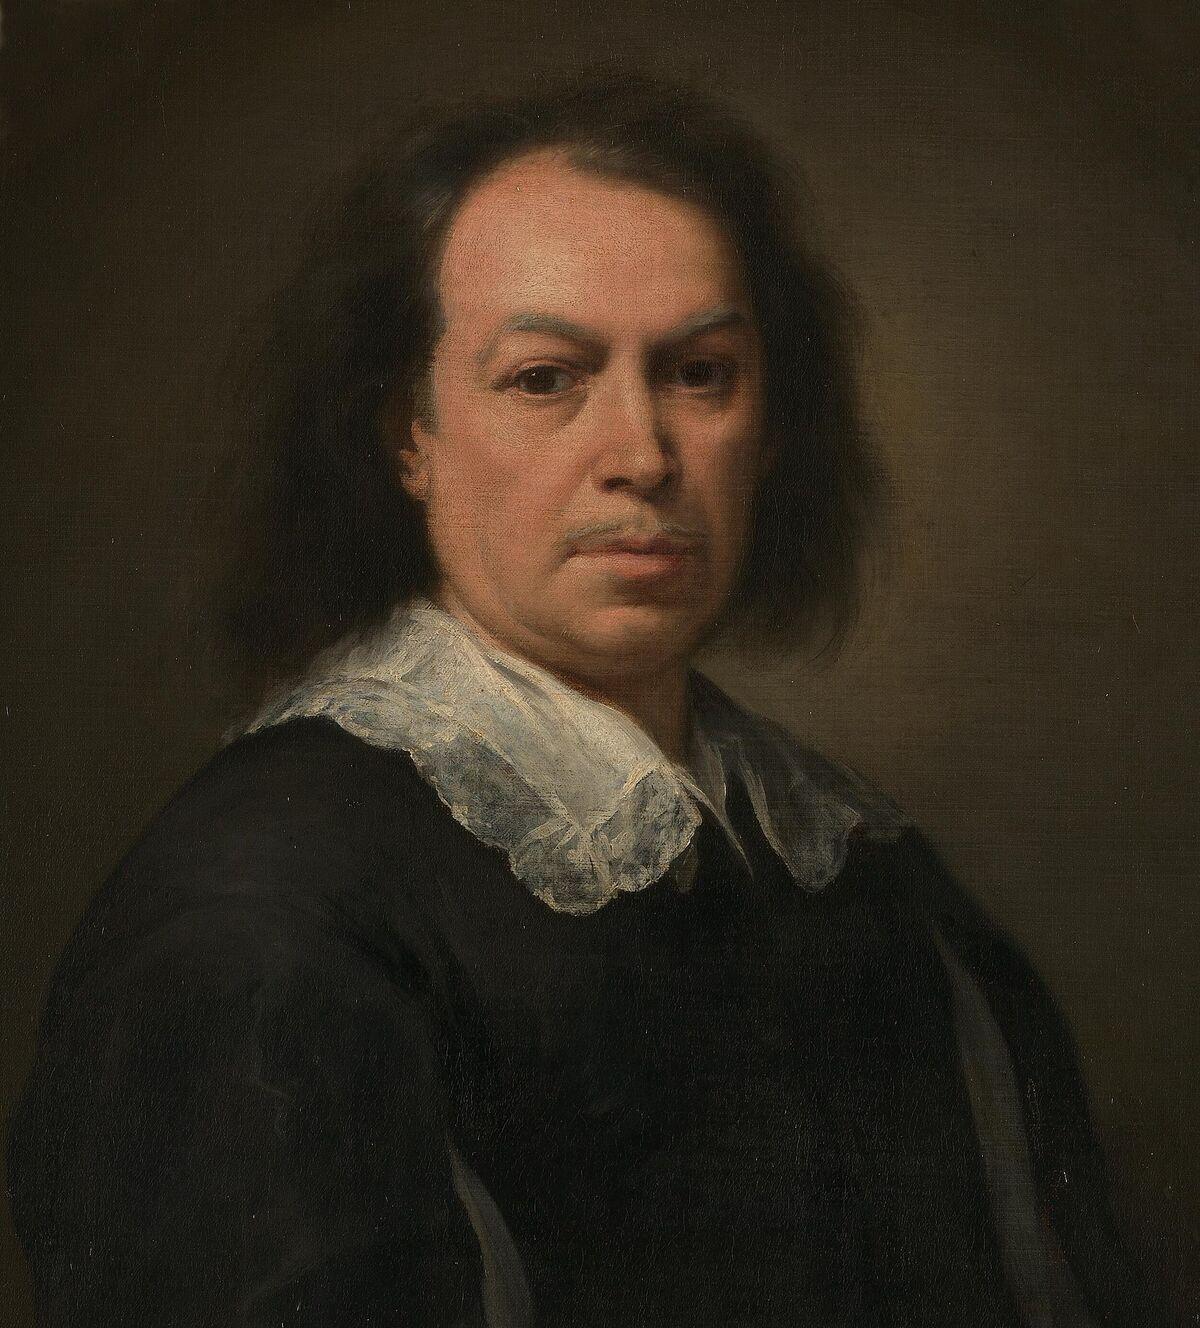 Bartolomé Esteban Murillo, Self-portrait, Portrait of Bartolomé Esteban Murillo, 1668-1670. Image via Wikimedia Commons.